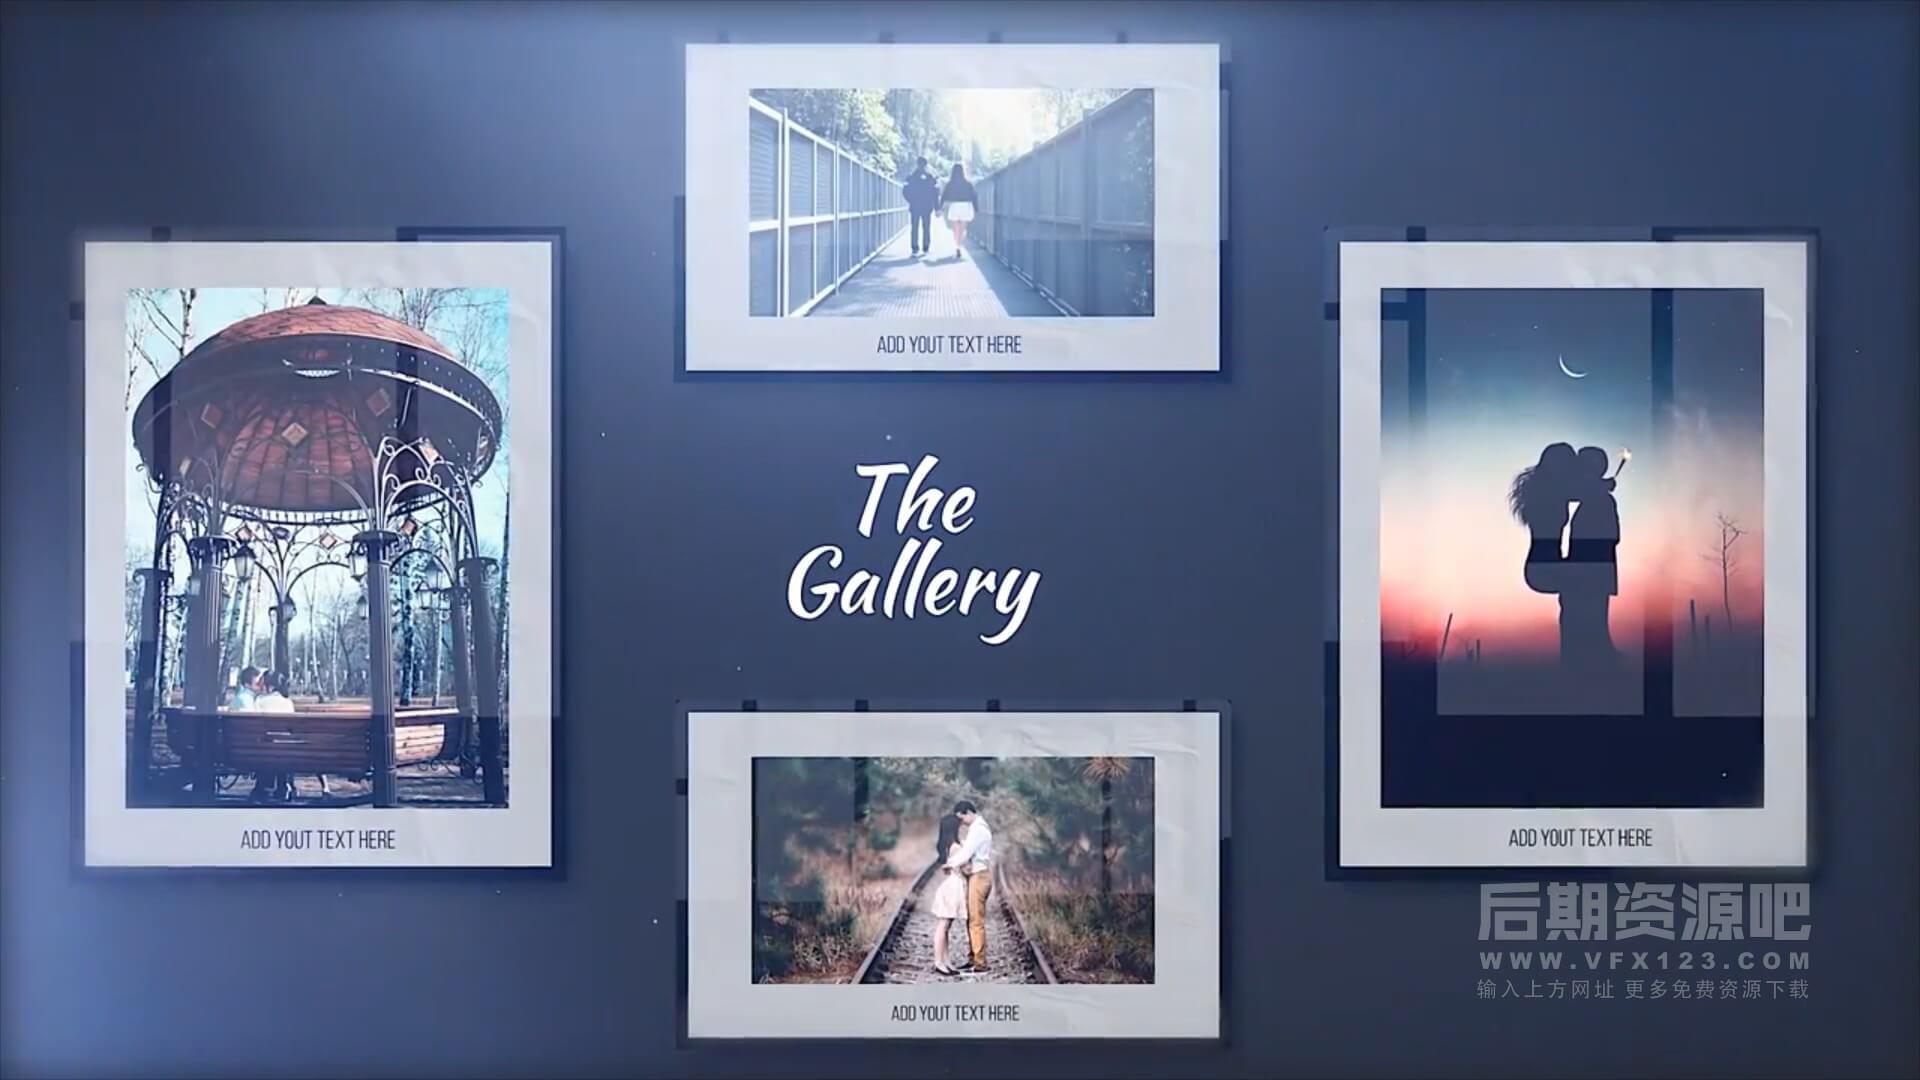 fcpx插件 温馨浪漫纪念电子相册图文展示模板 13个分镜 The Gallery